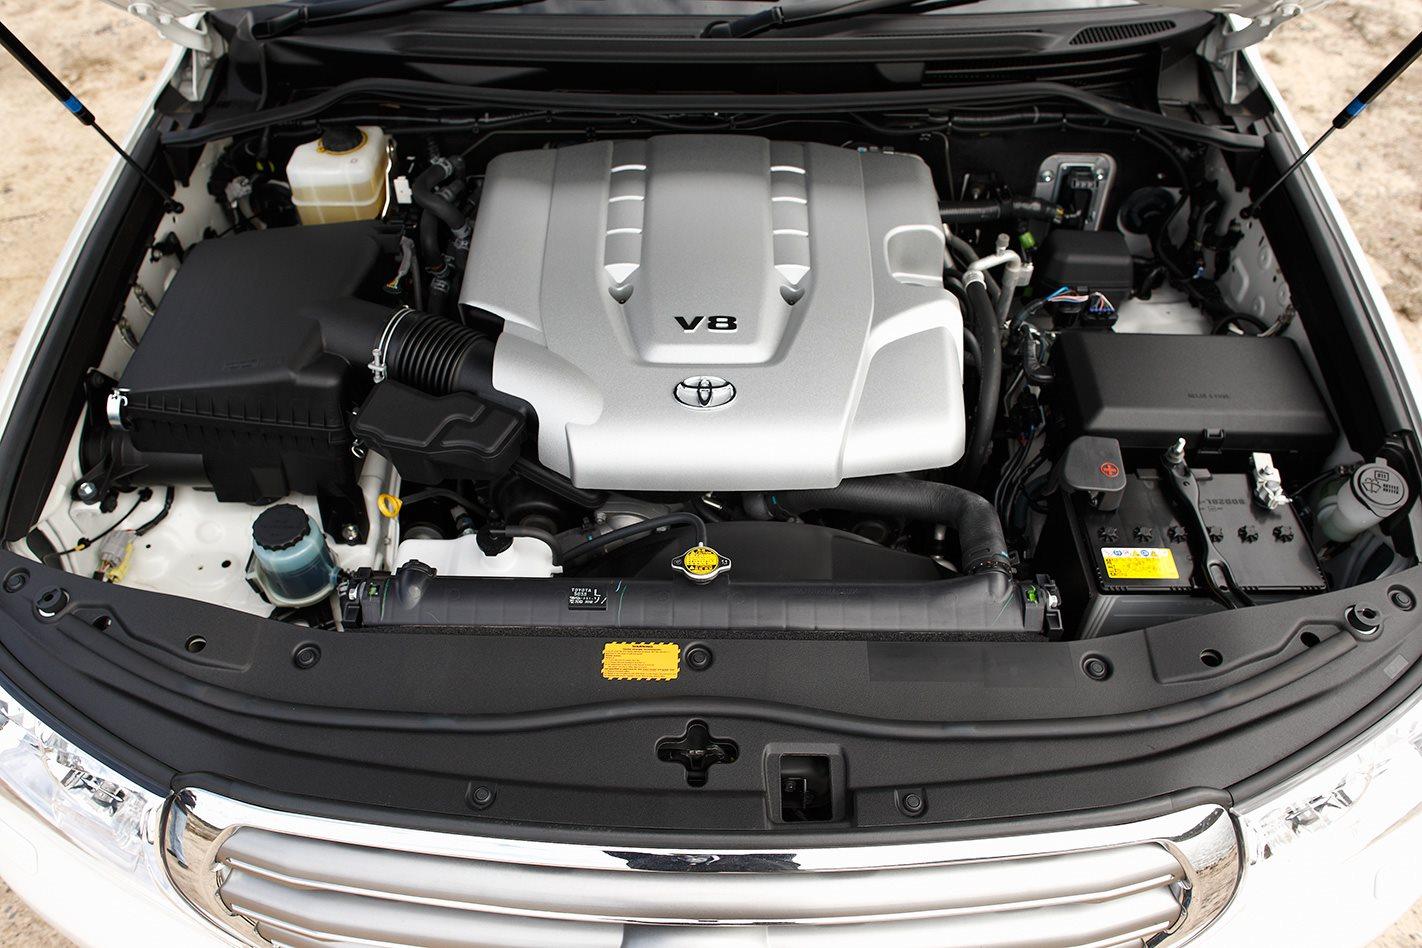 2011 Toyota LandCruiser 200 Series engine.jpg